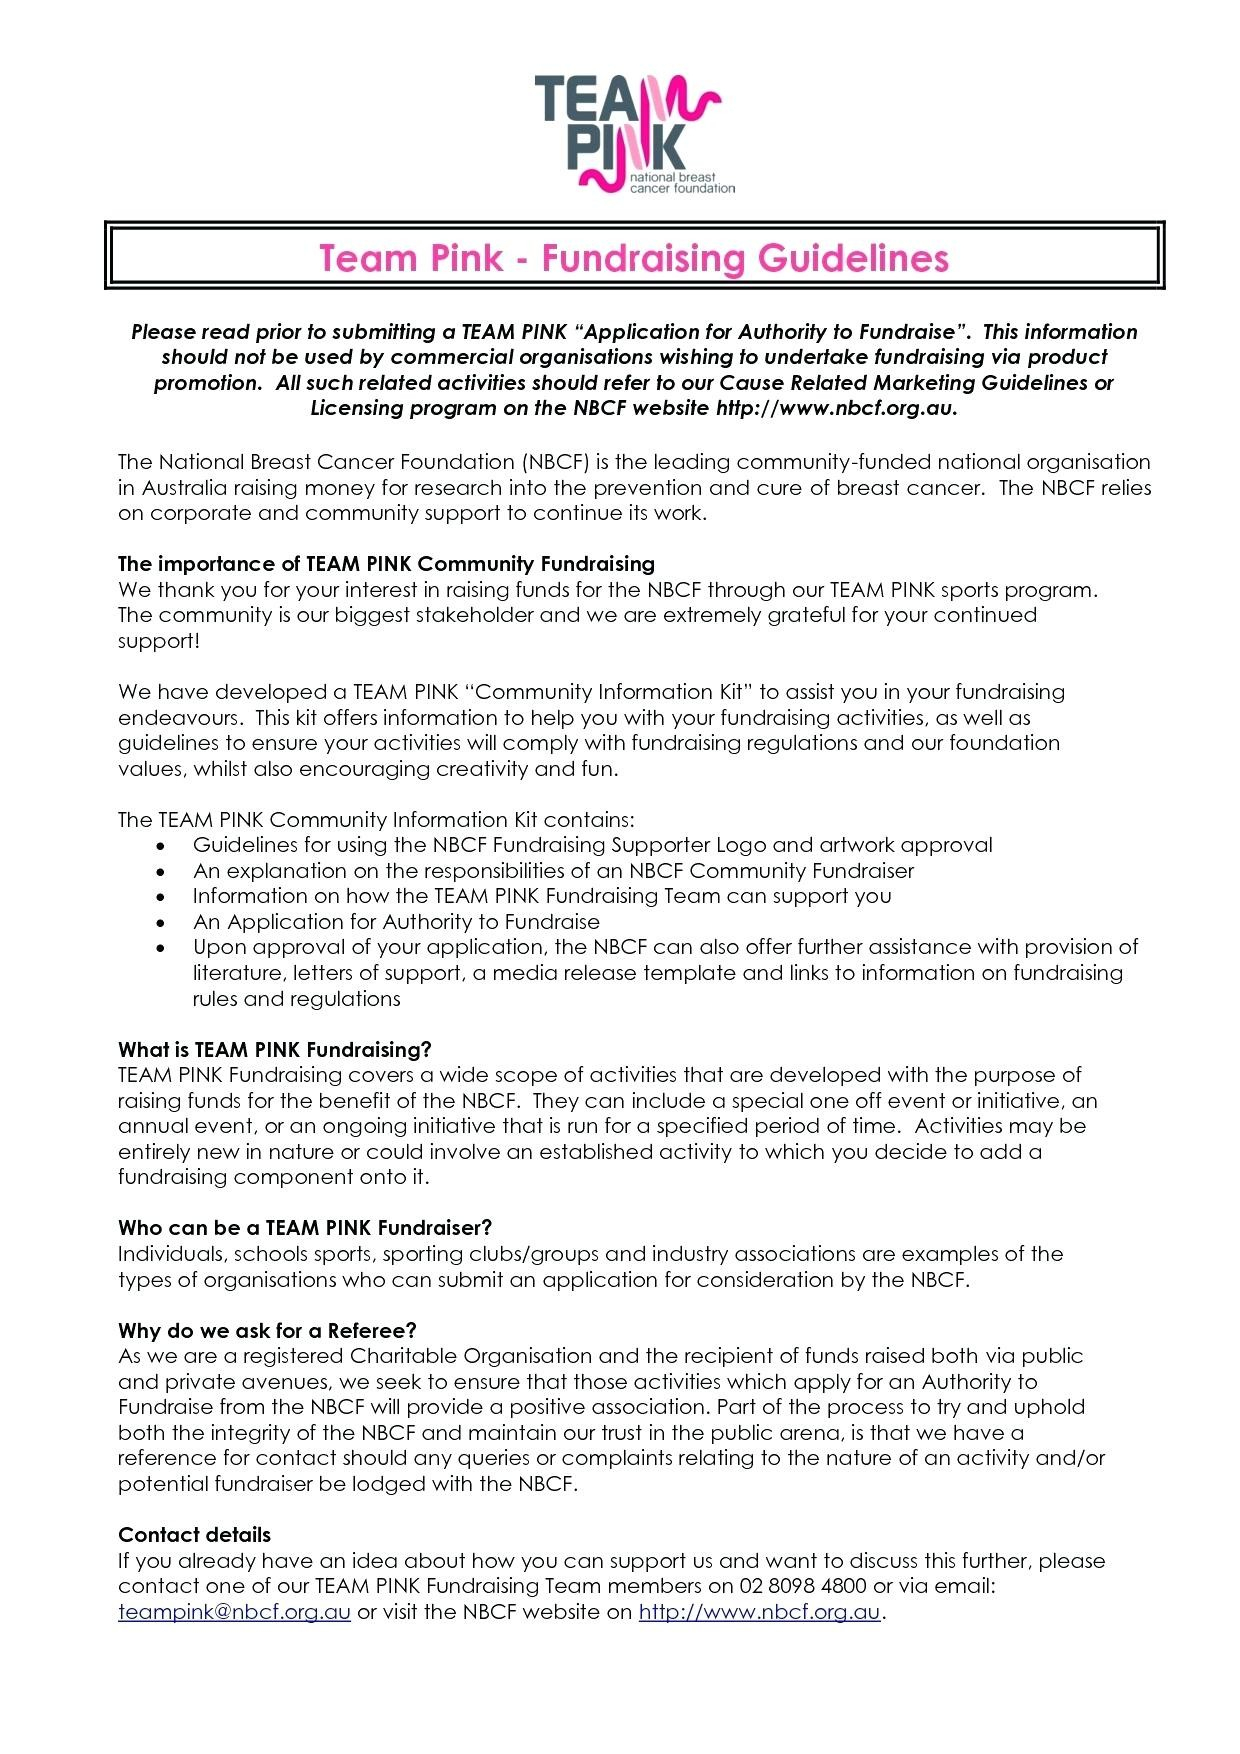 School Sponsorship Letter Template - Leave Absence Letter Template for School Copy School Application